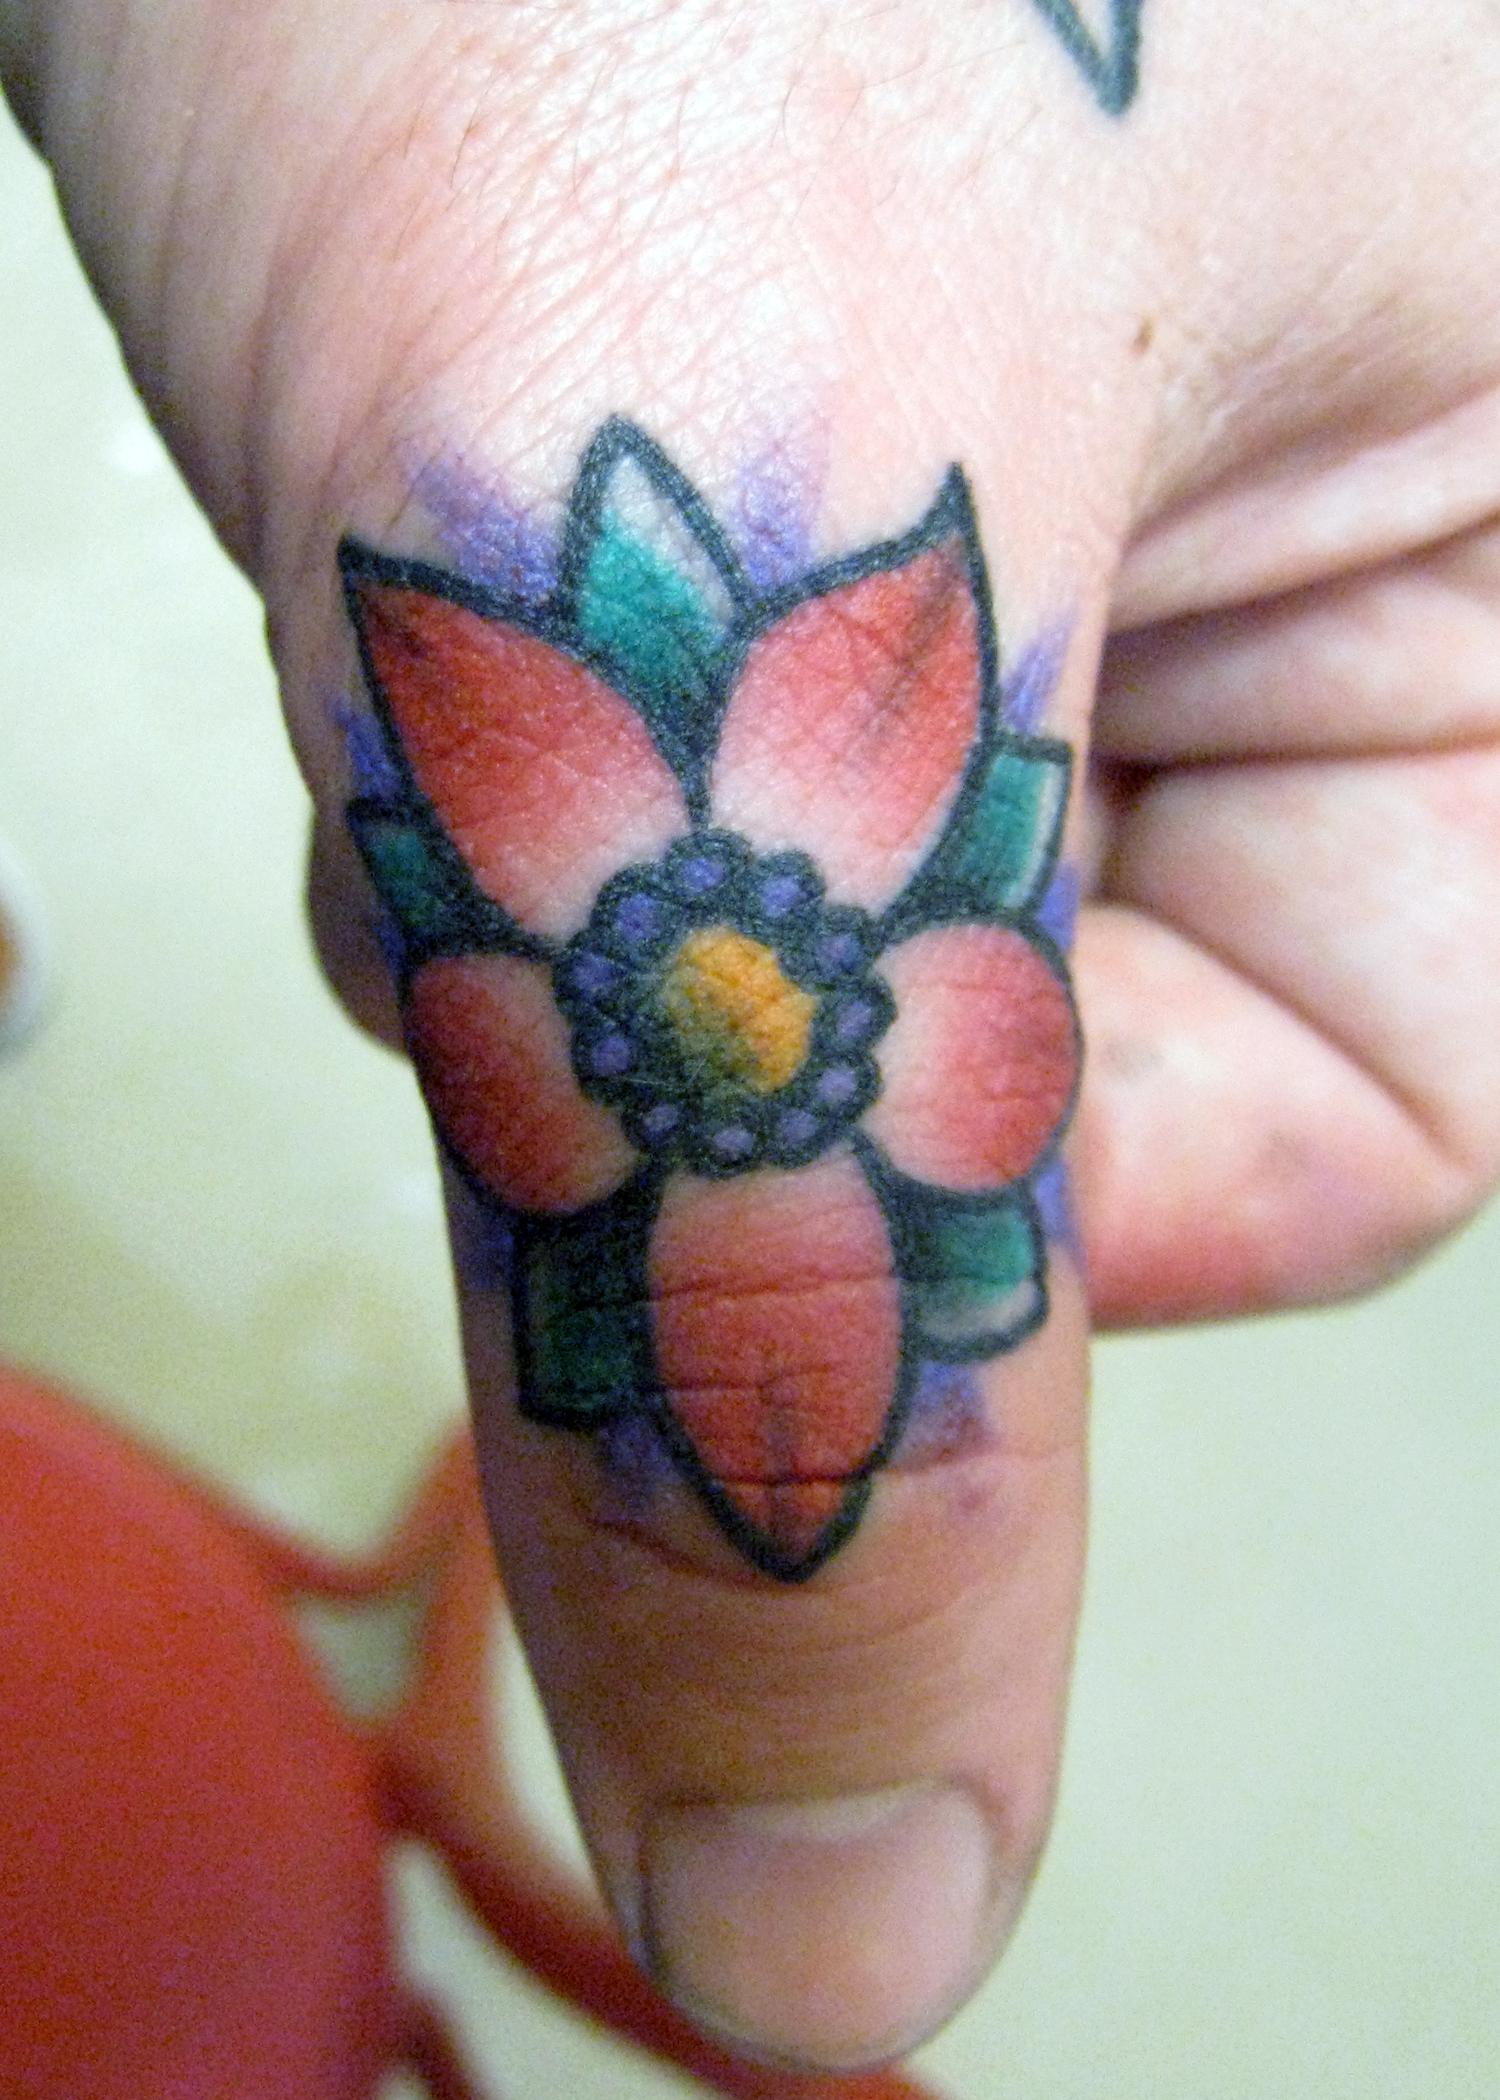 Jason monroe bilder news infos aus dem web for Independent tattoo lincoln ne